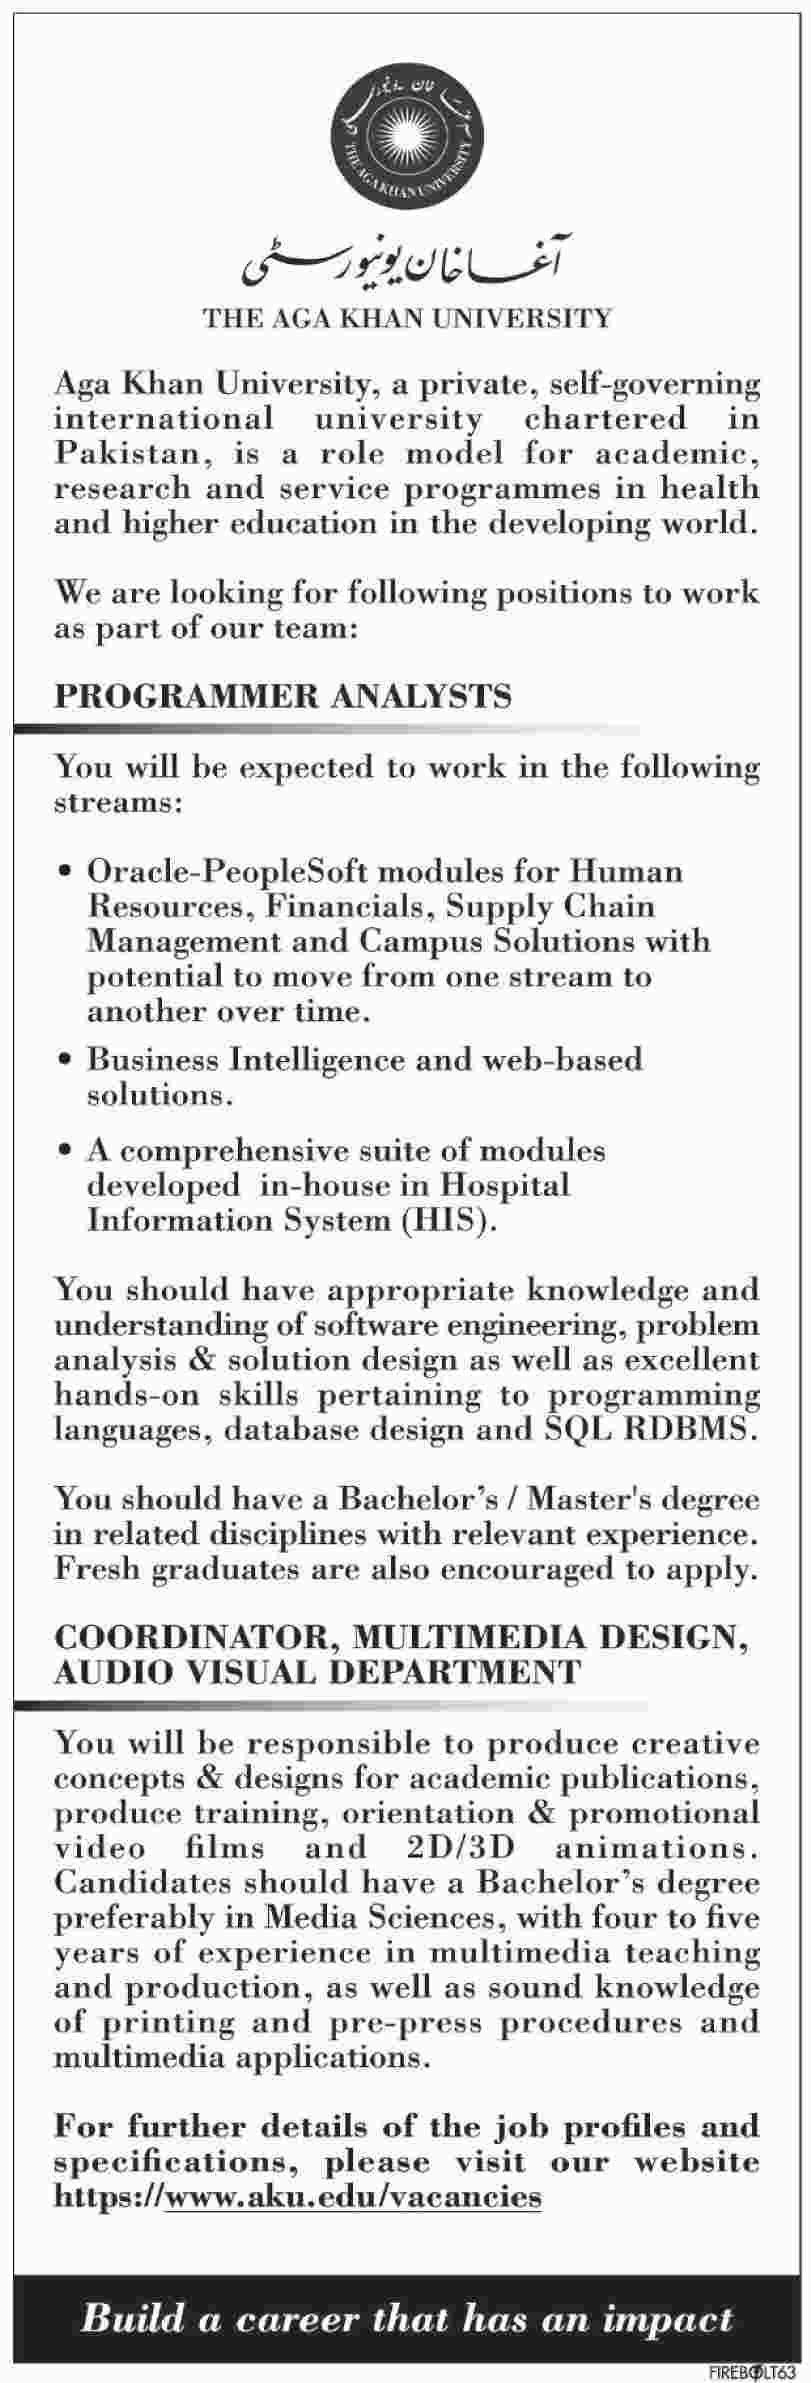 Jobs In The Aga Khan University Karachi Pakistan  January